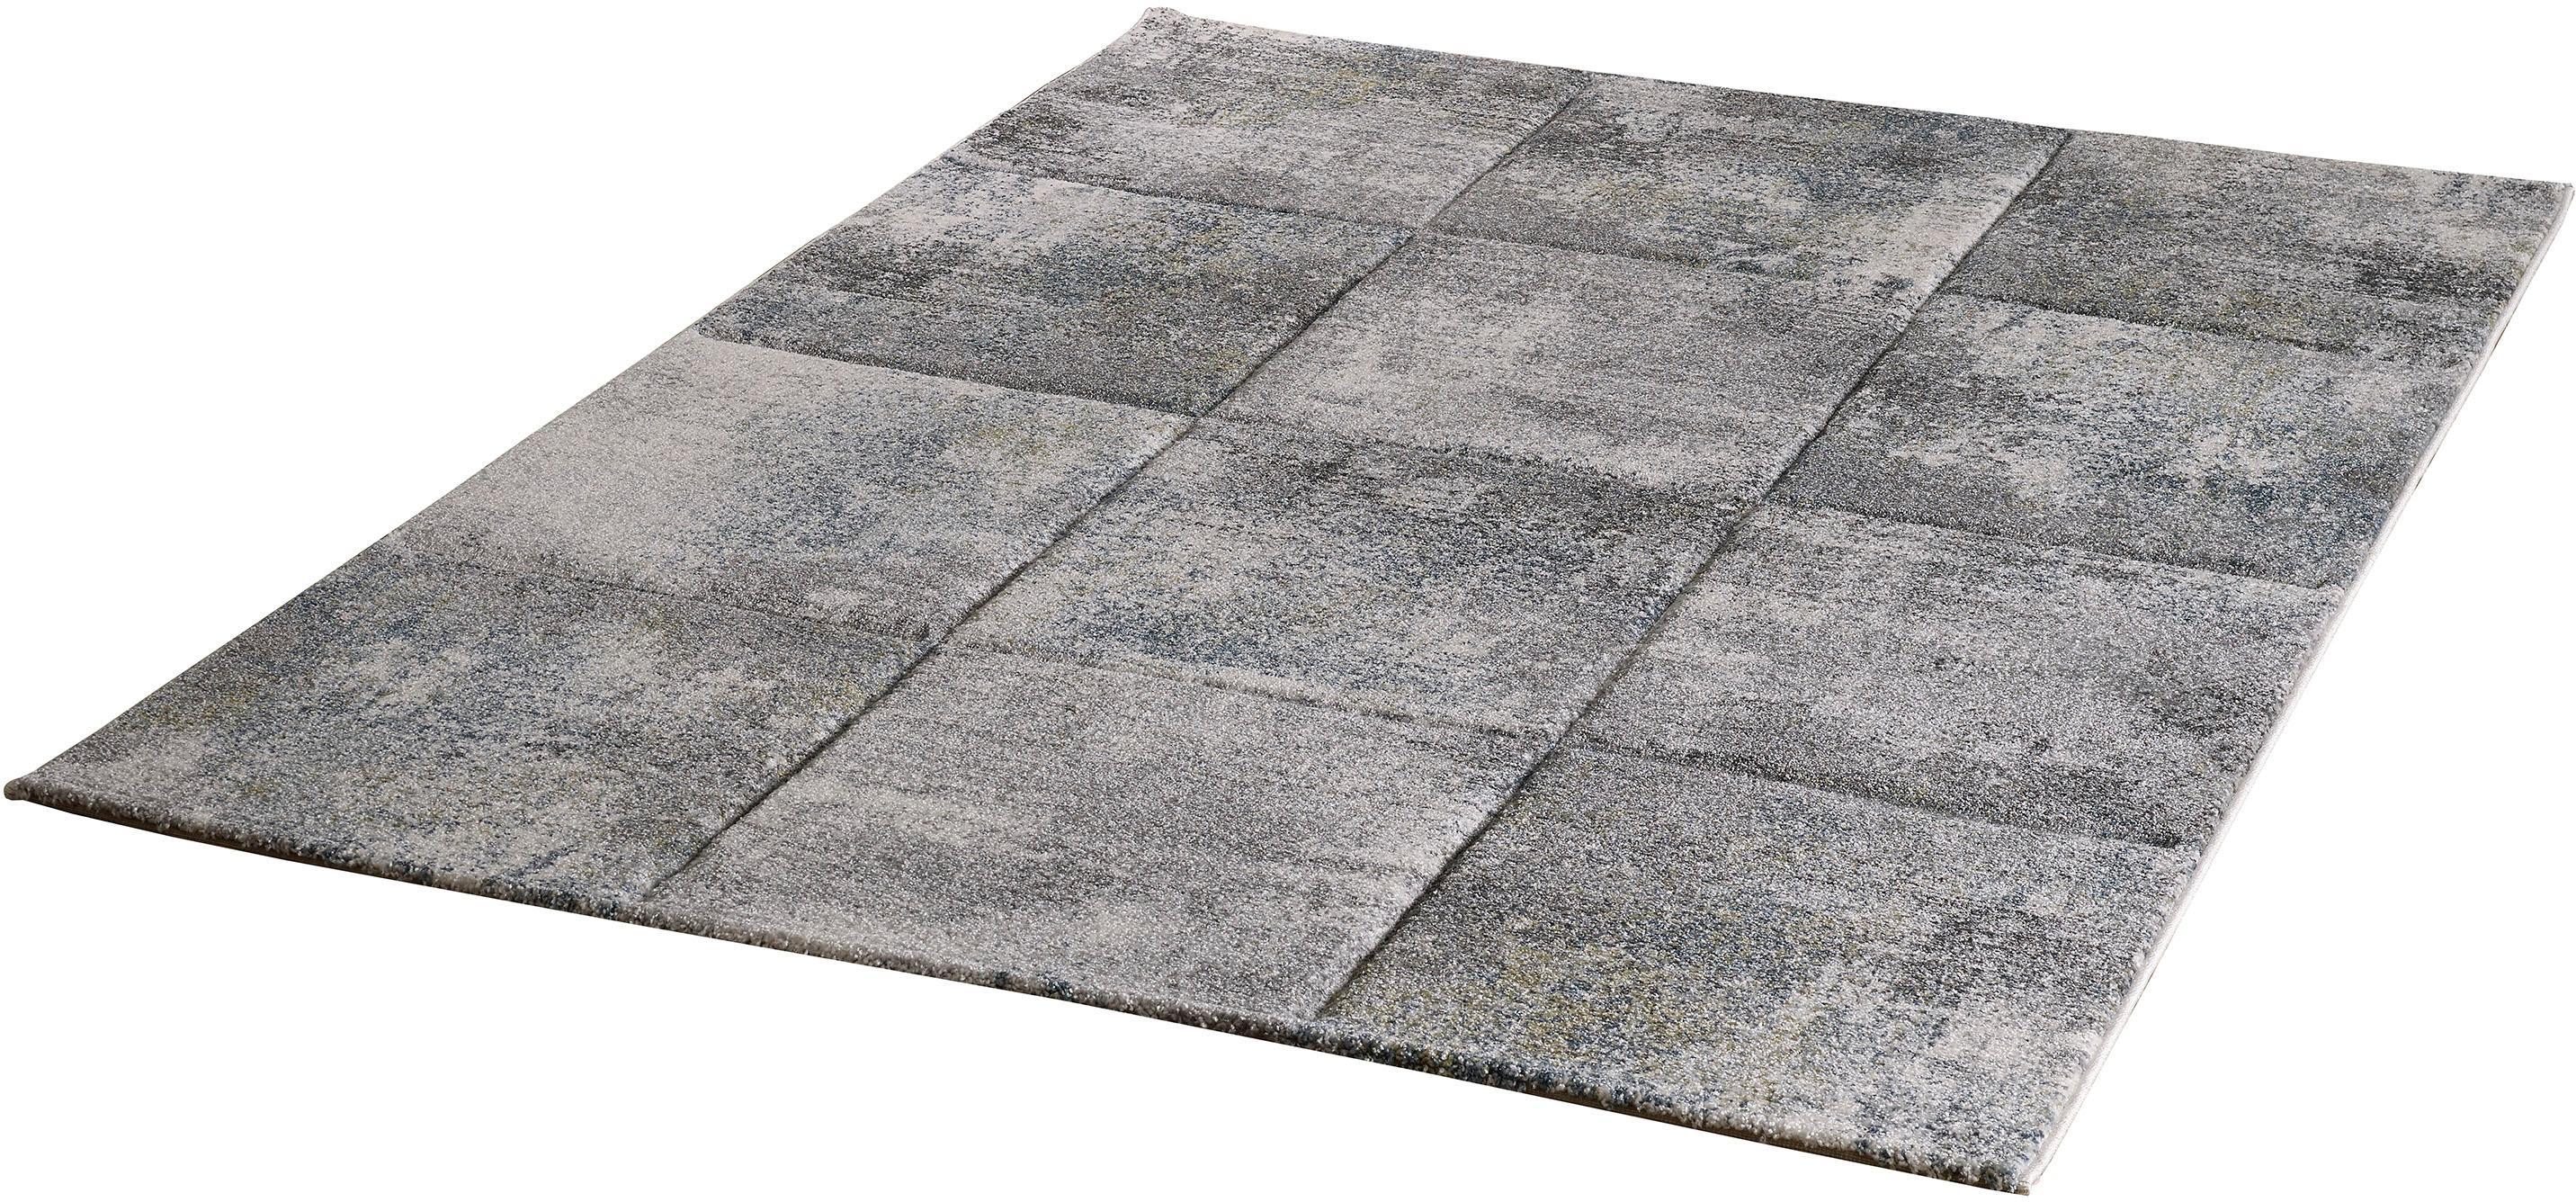 Teppich Lorena 2903 Sanat Teppiche rechteckig Höhe 13 mm maschinell gewebt